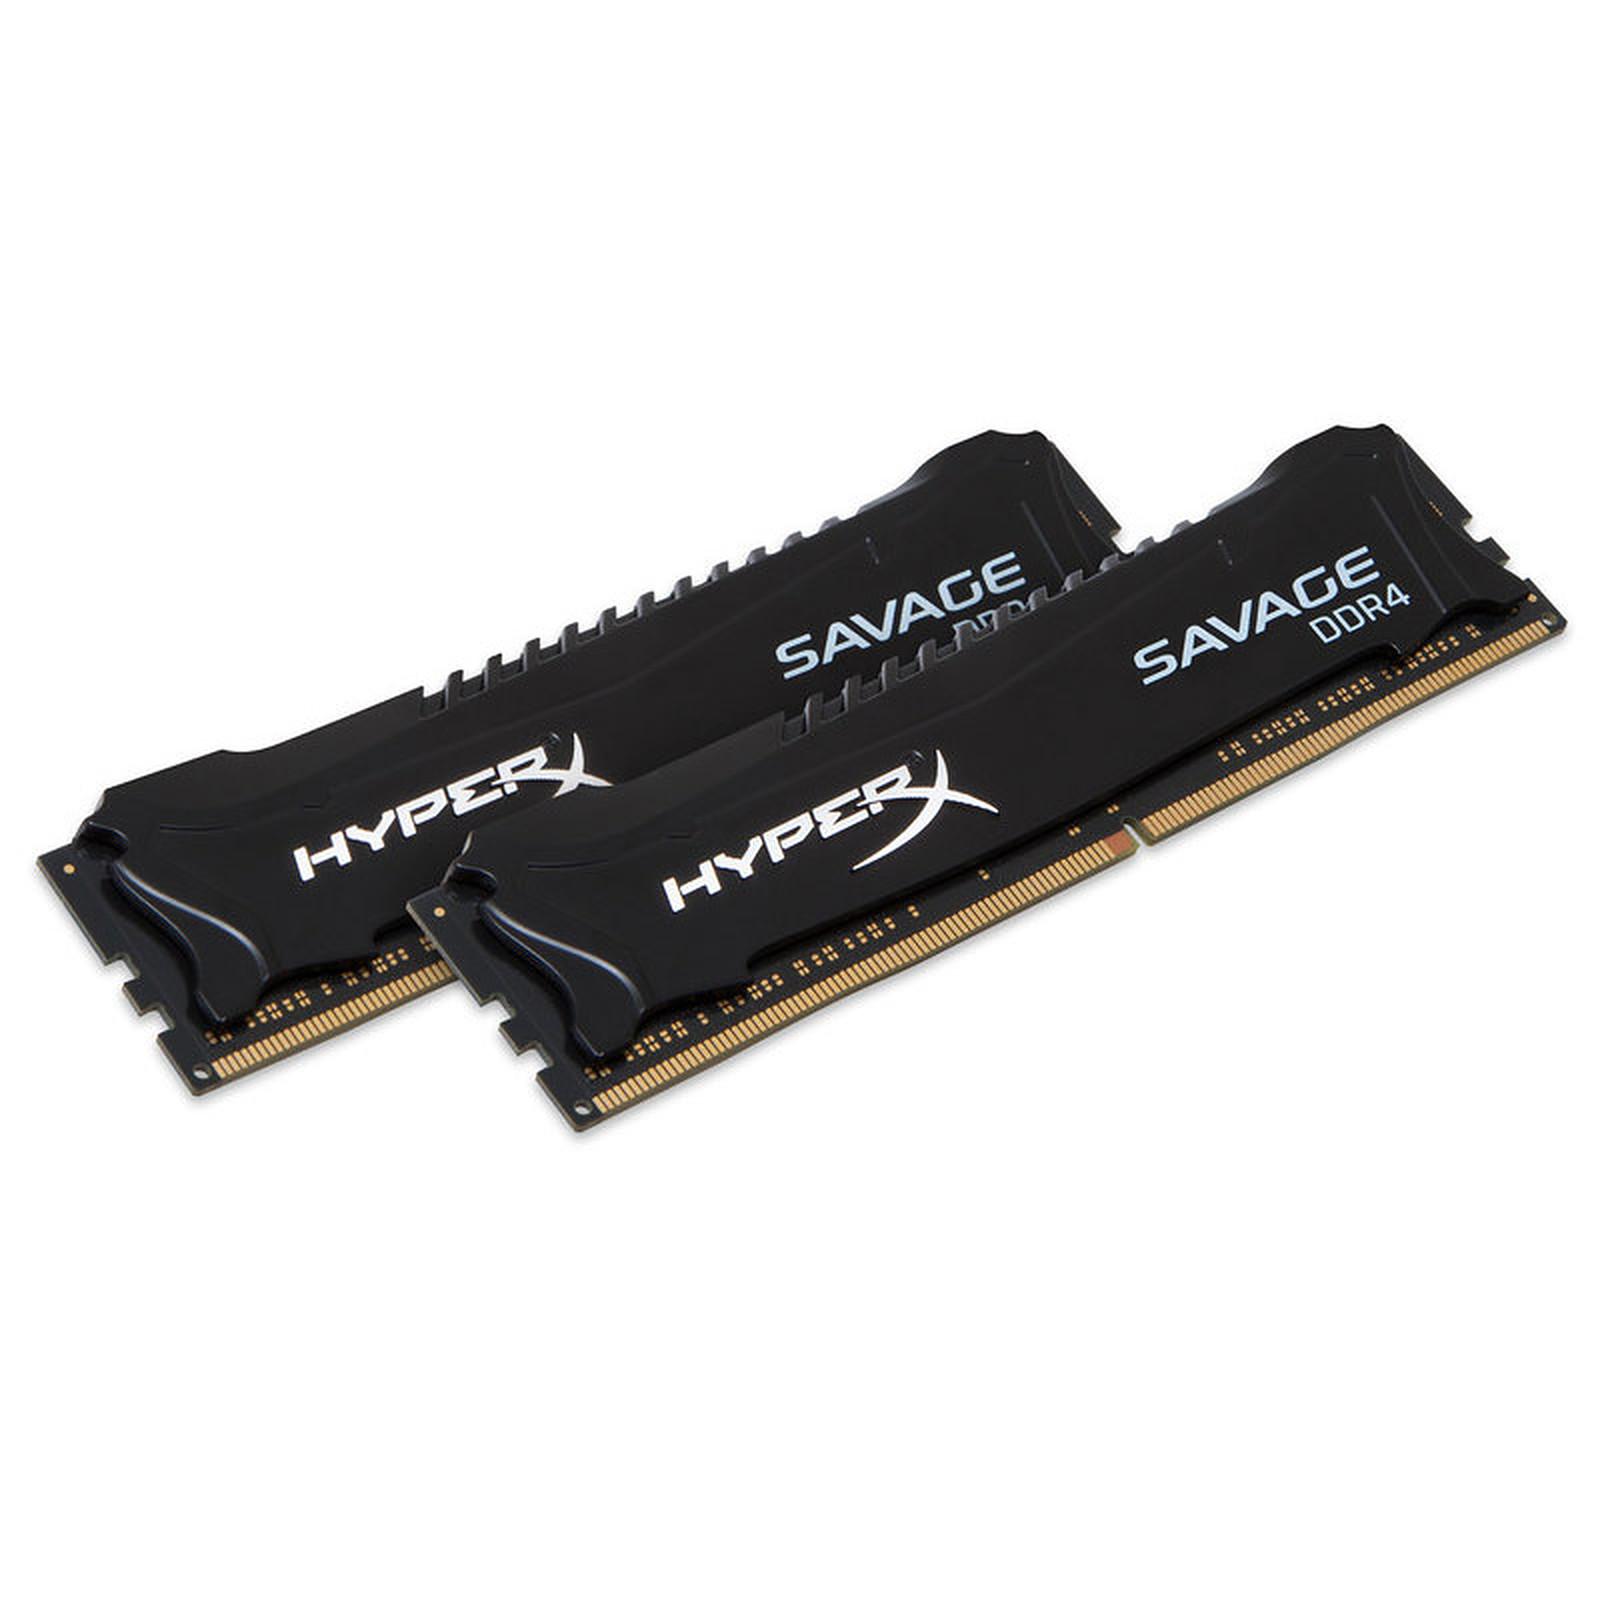 HyperX Savage Noir 8 Go (2x 4Go) DDR4 2666 MHz CL13